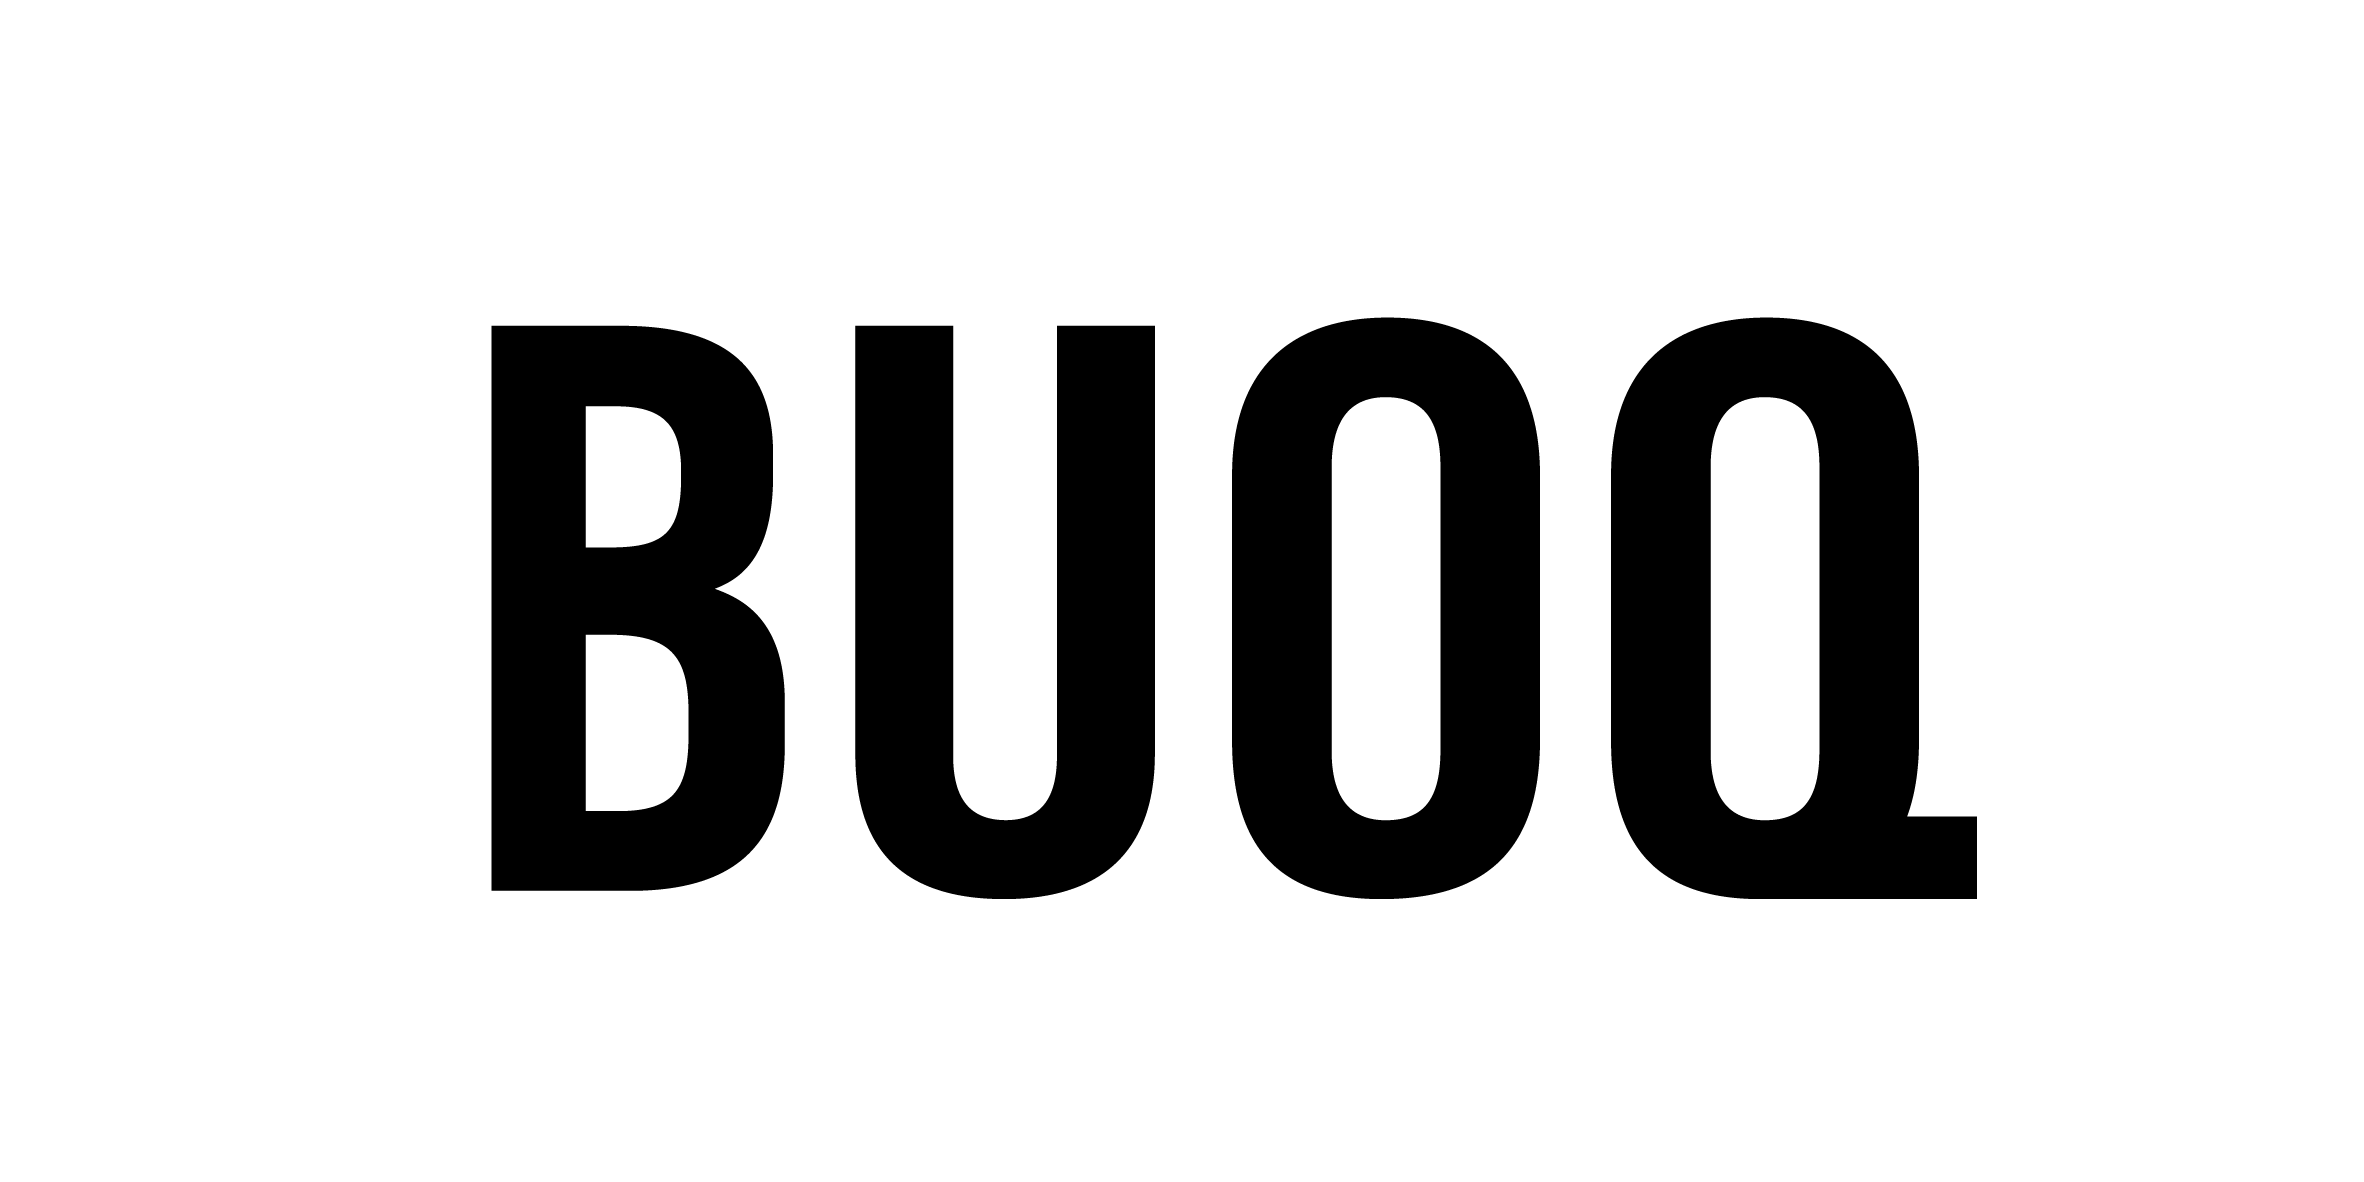 BUOQ logo